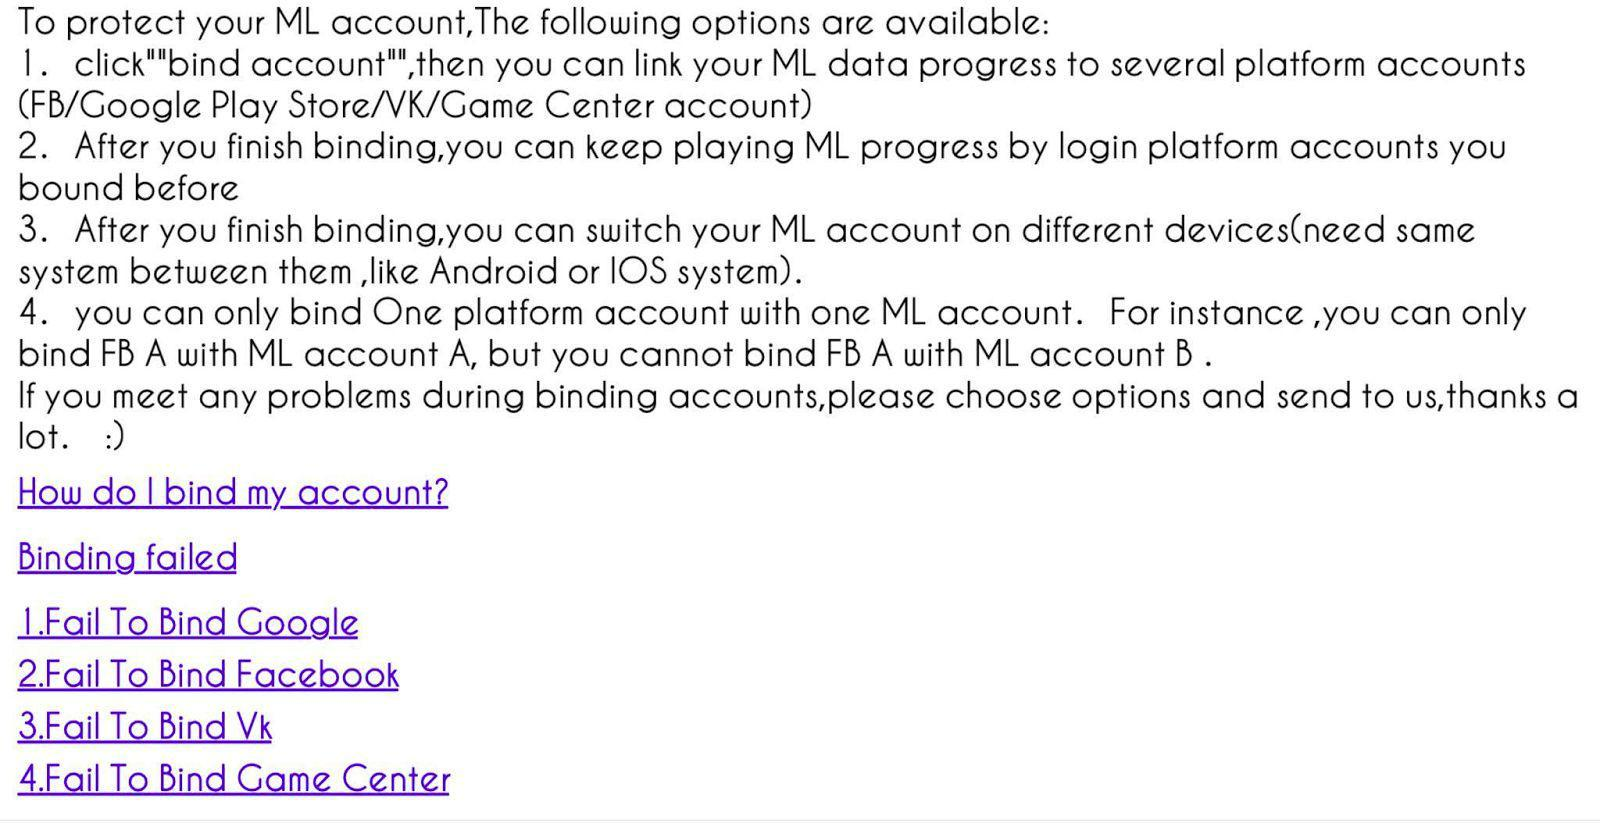 GUIDE] Account Problem - Bug Report - Mobile Legends: Bang